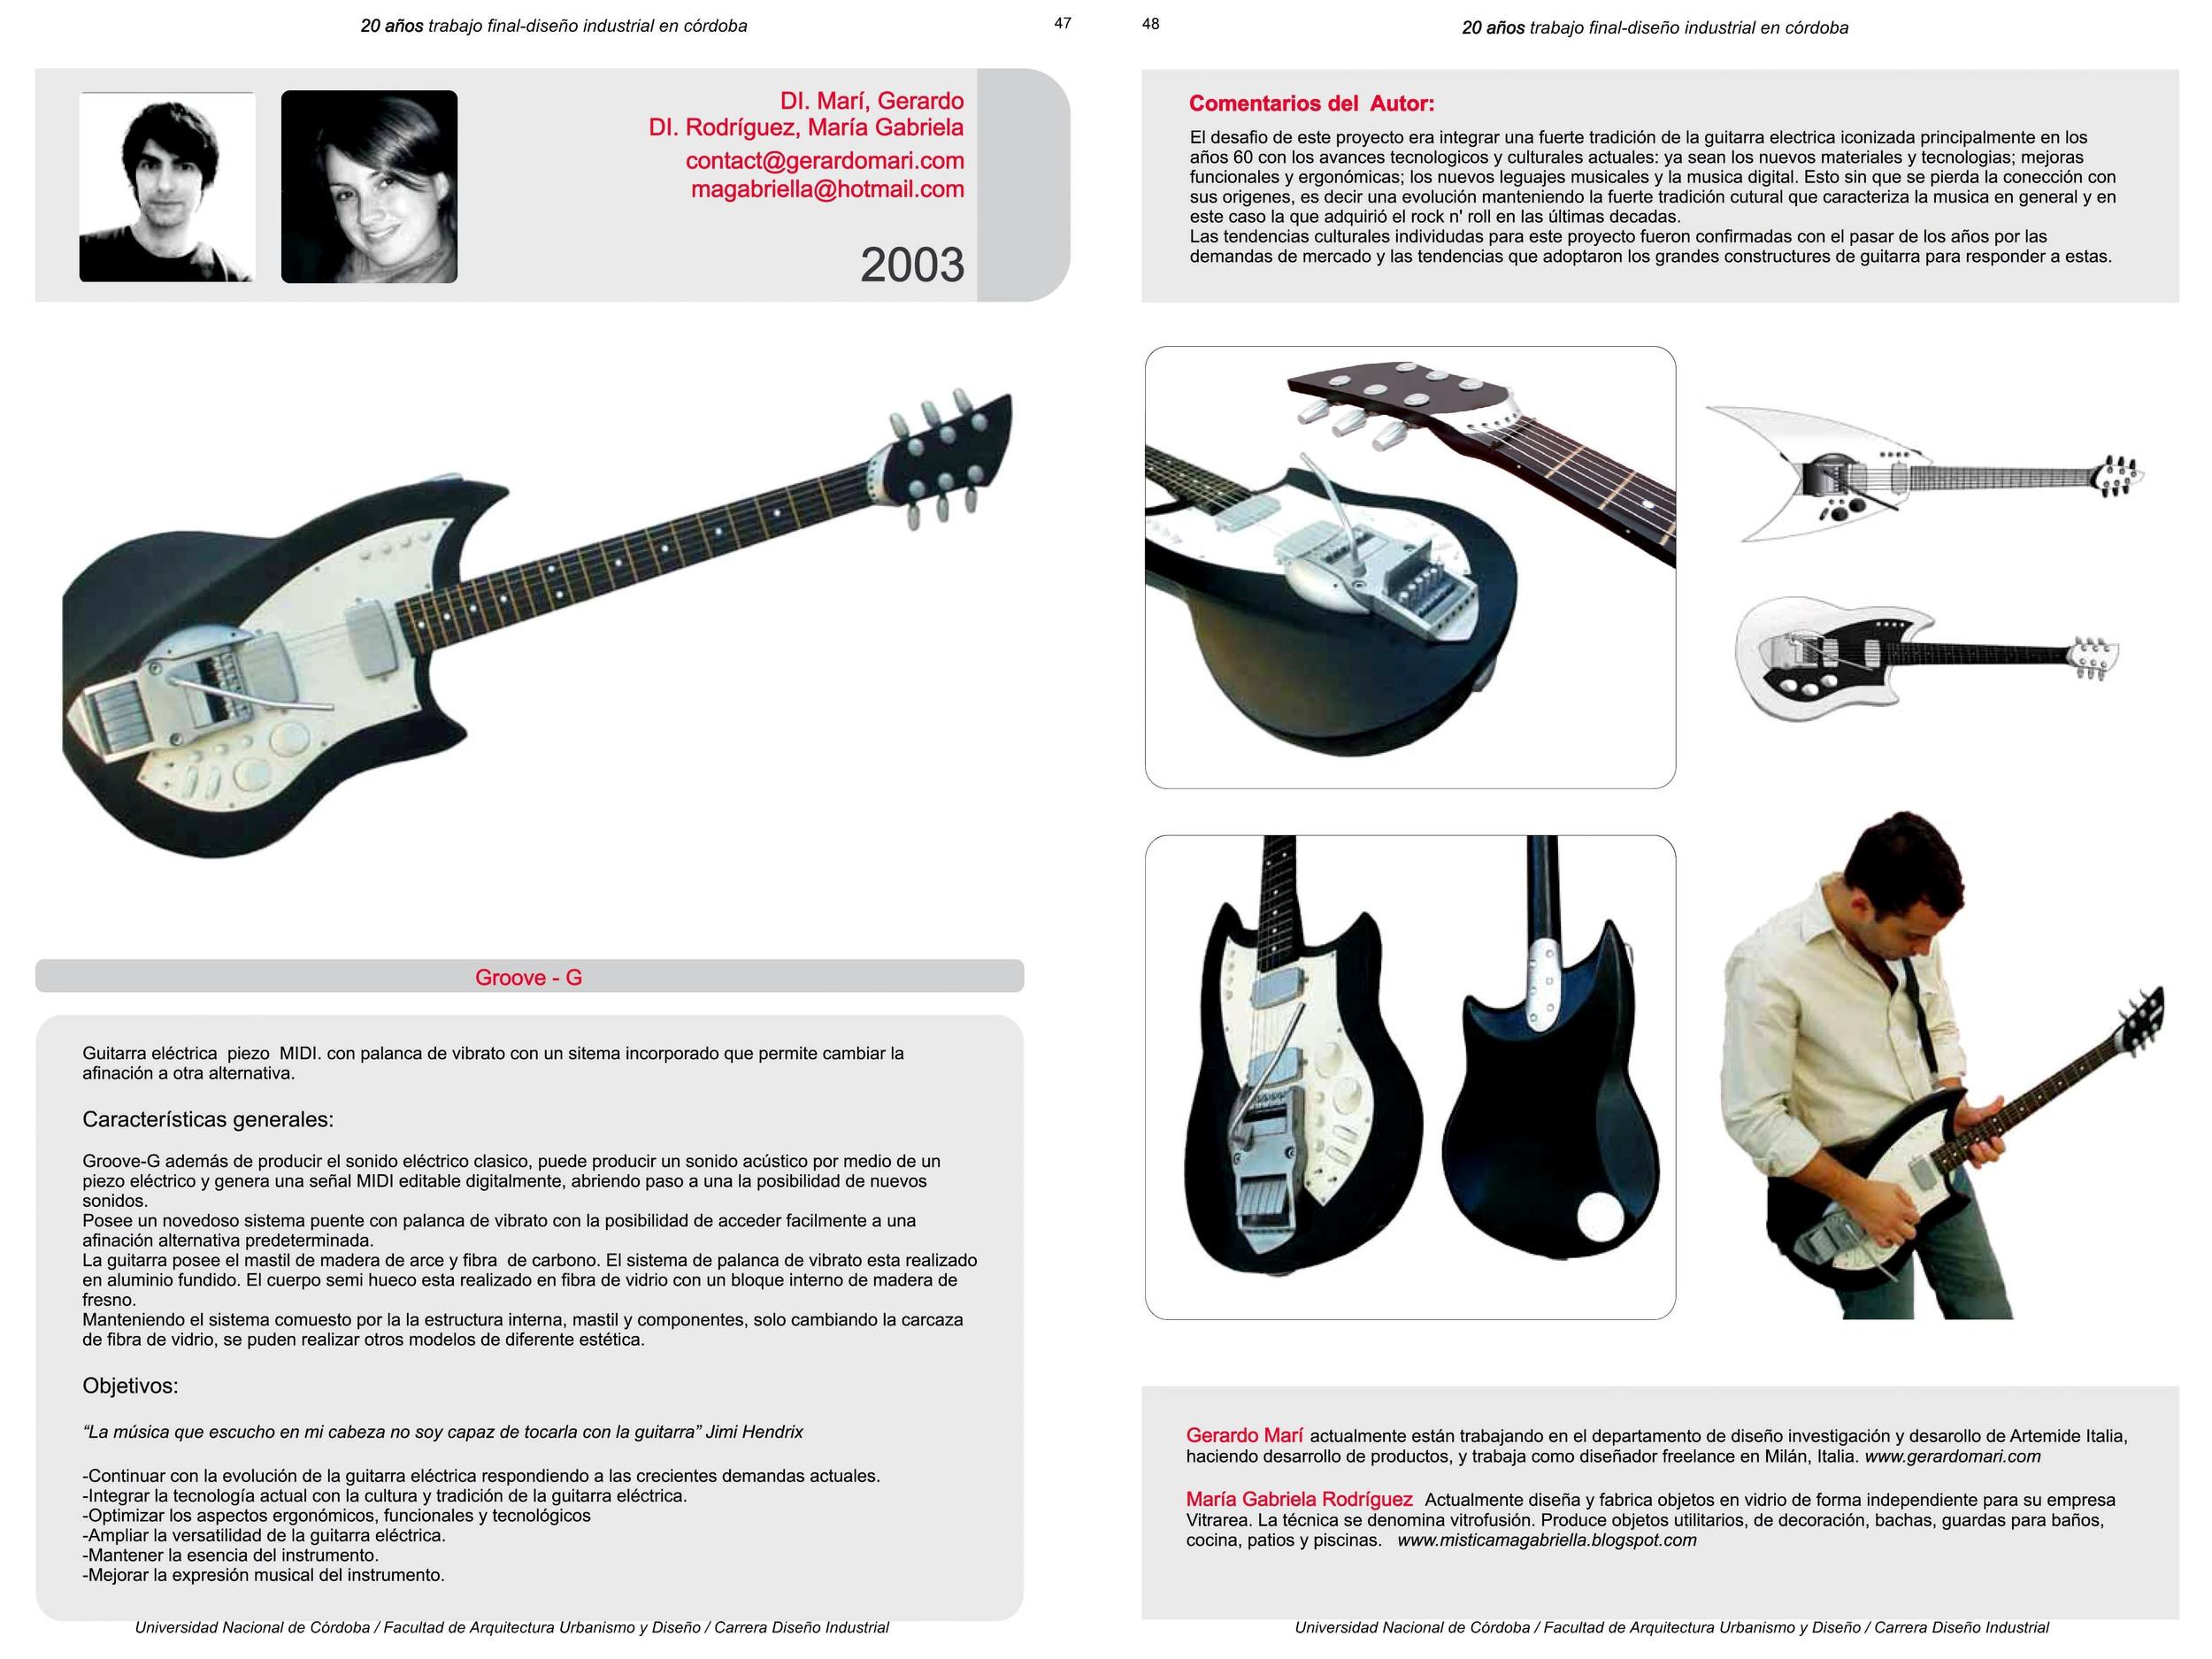 Diseño Industrial 20 años UNC - 2011 - Argentina - p 30 - Groove G